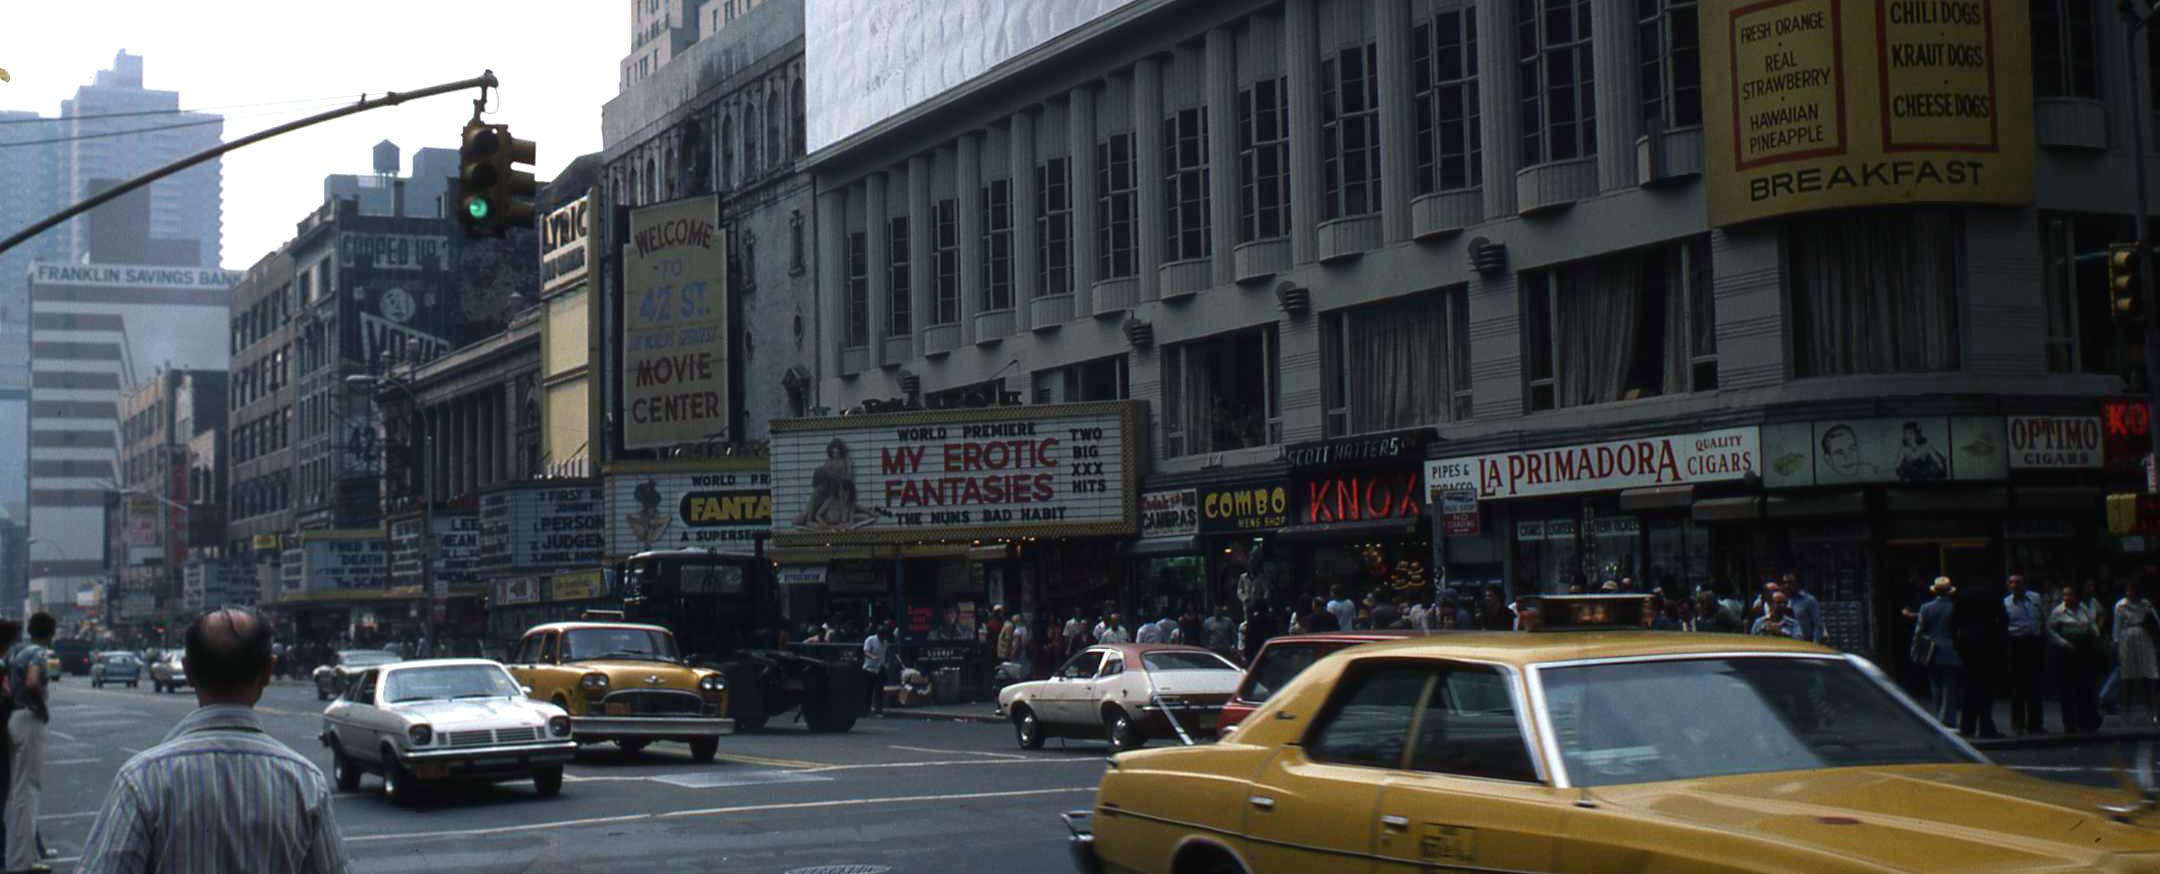 42nd street 1976